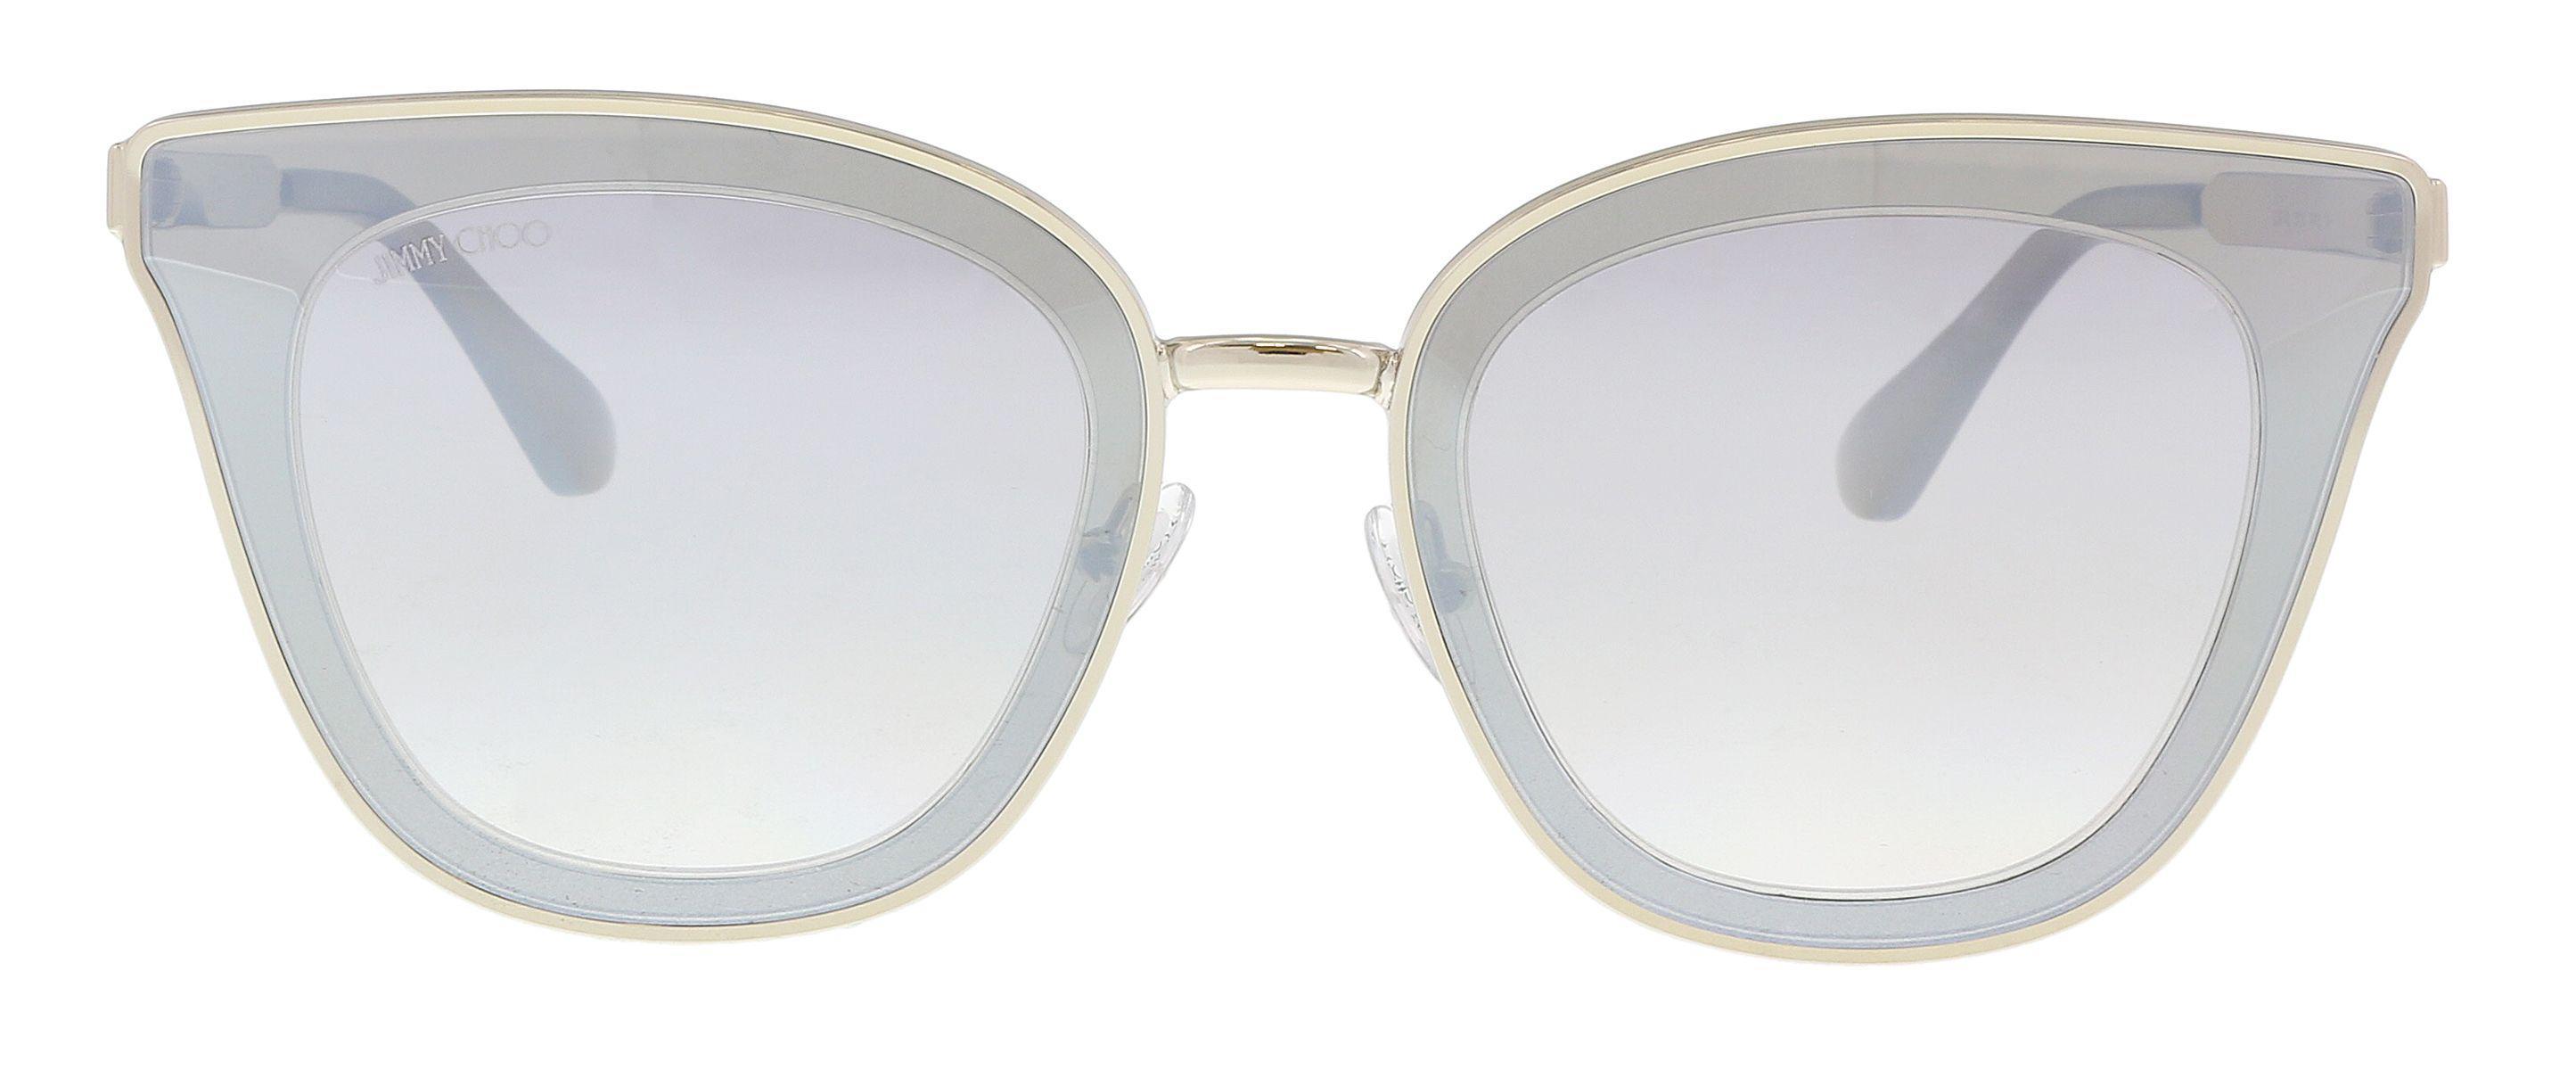 482ed89e514 Jimmy Choo - Metallic Lory s 0ky2 Gold  Blue Cat Eye Sunglasses - Lyst.  View fullscreen